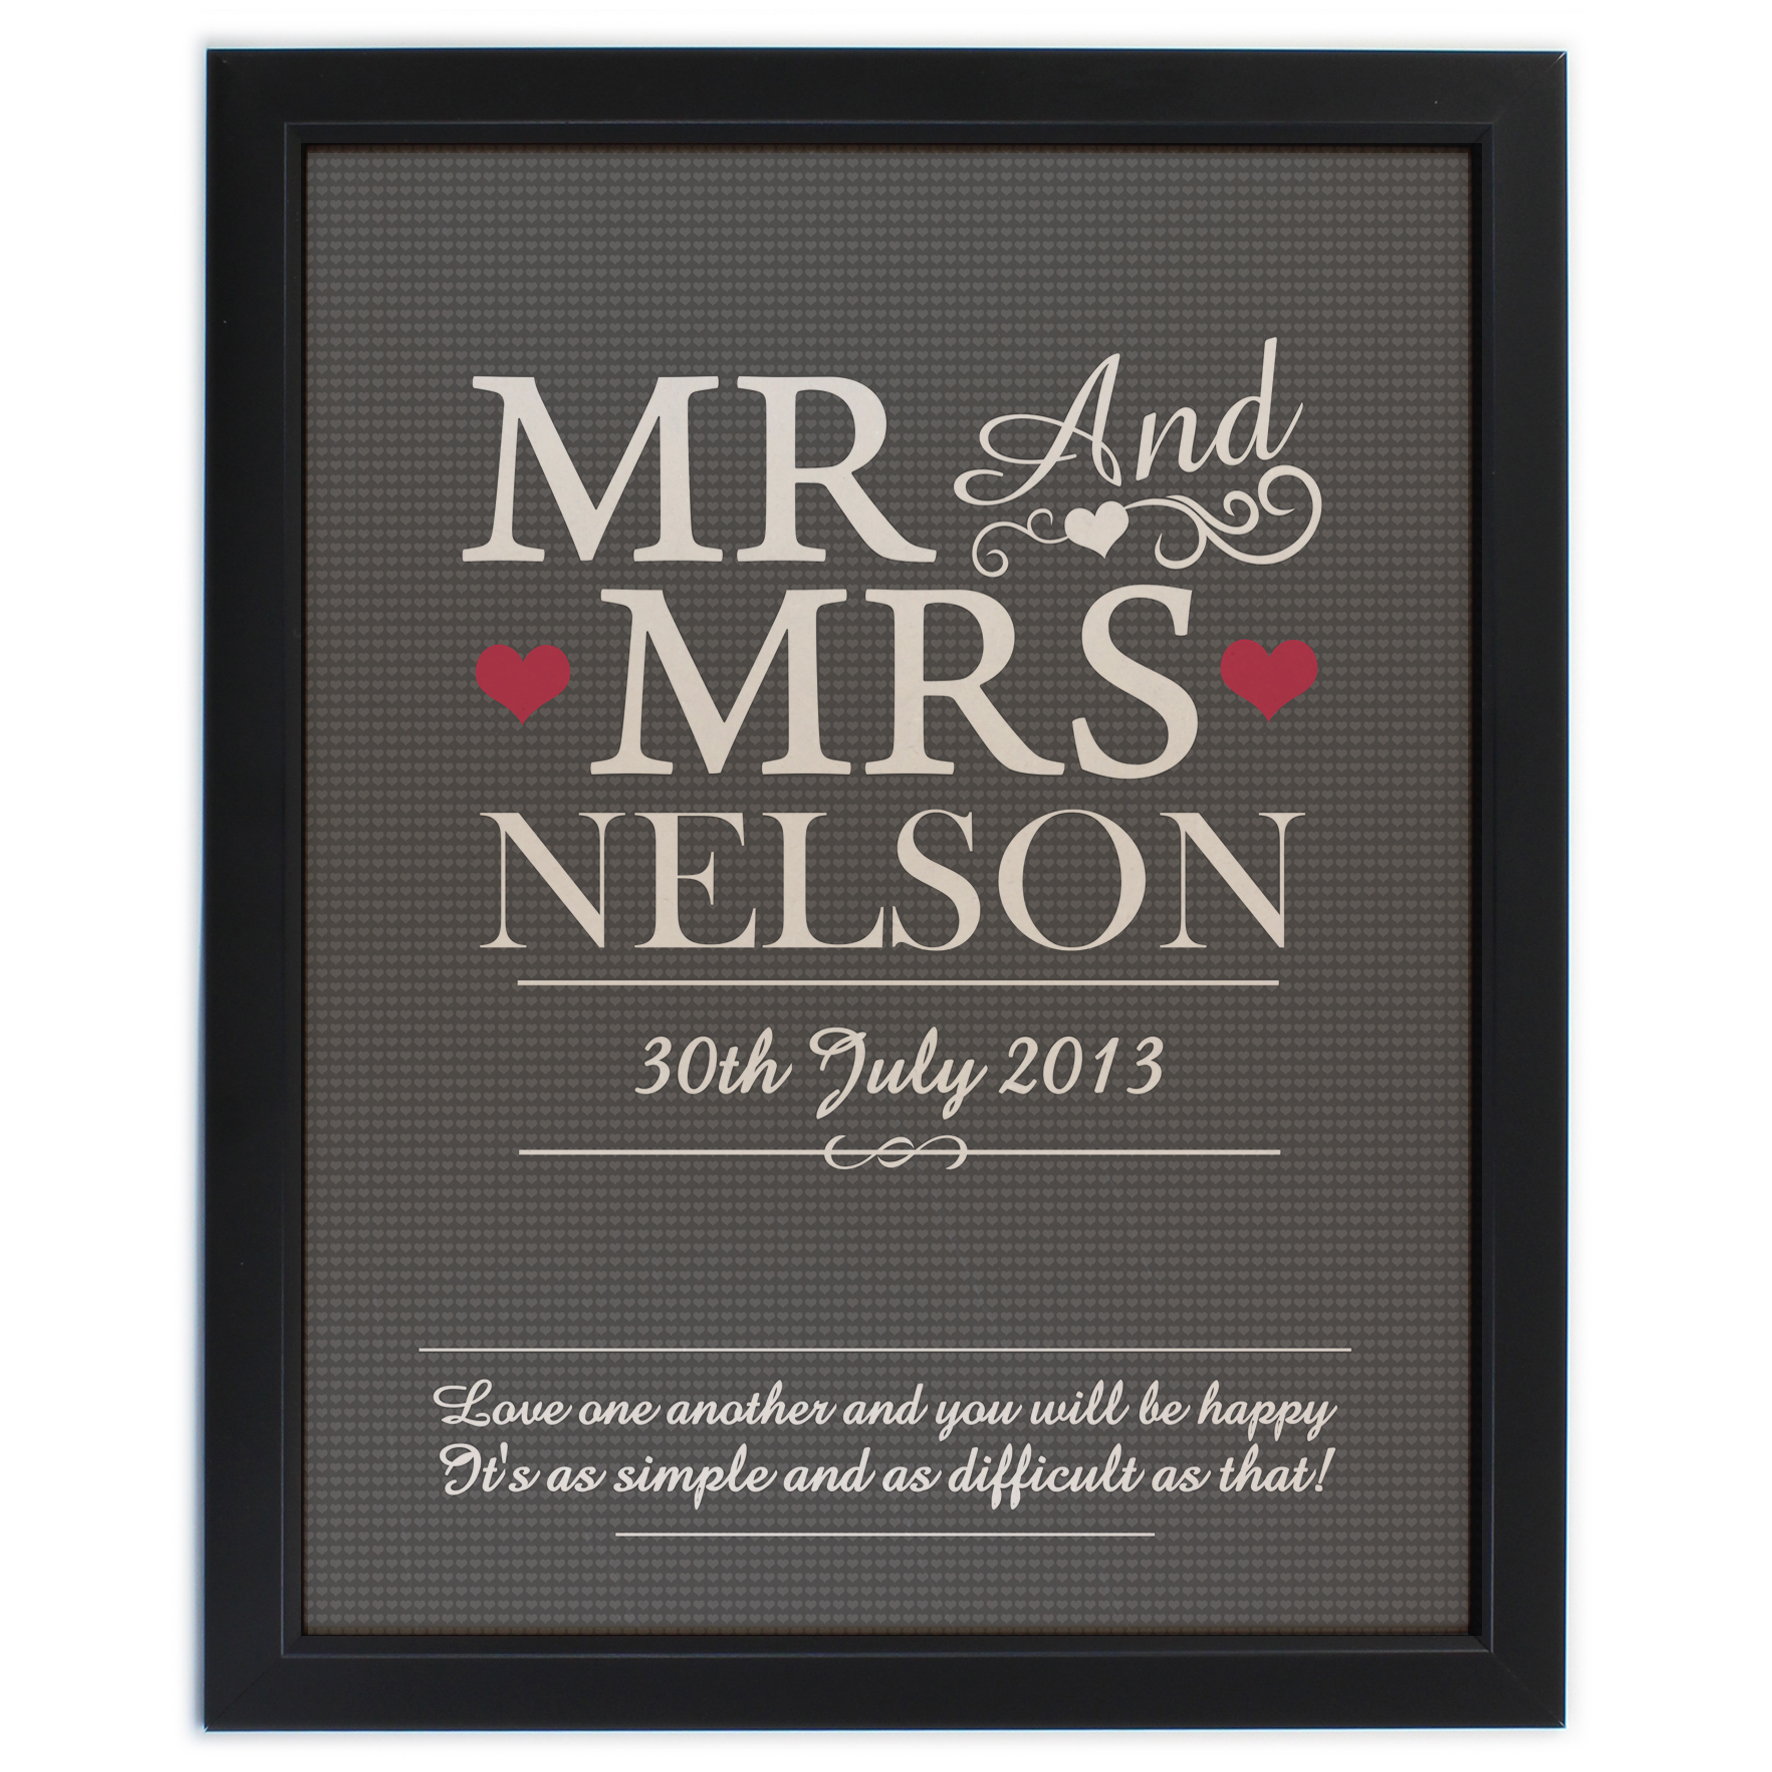 Personalised Mr & Mrs Framed Print